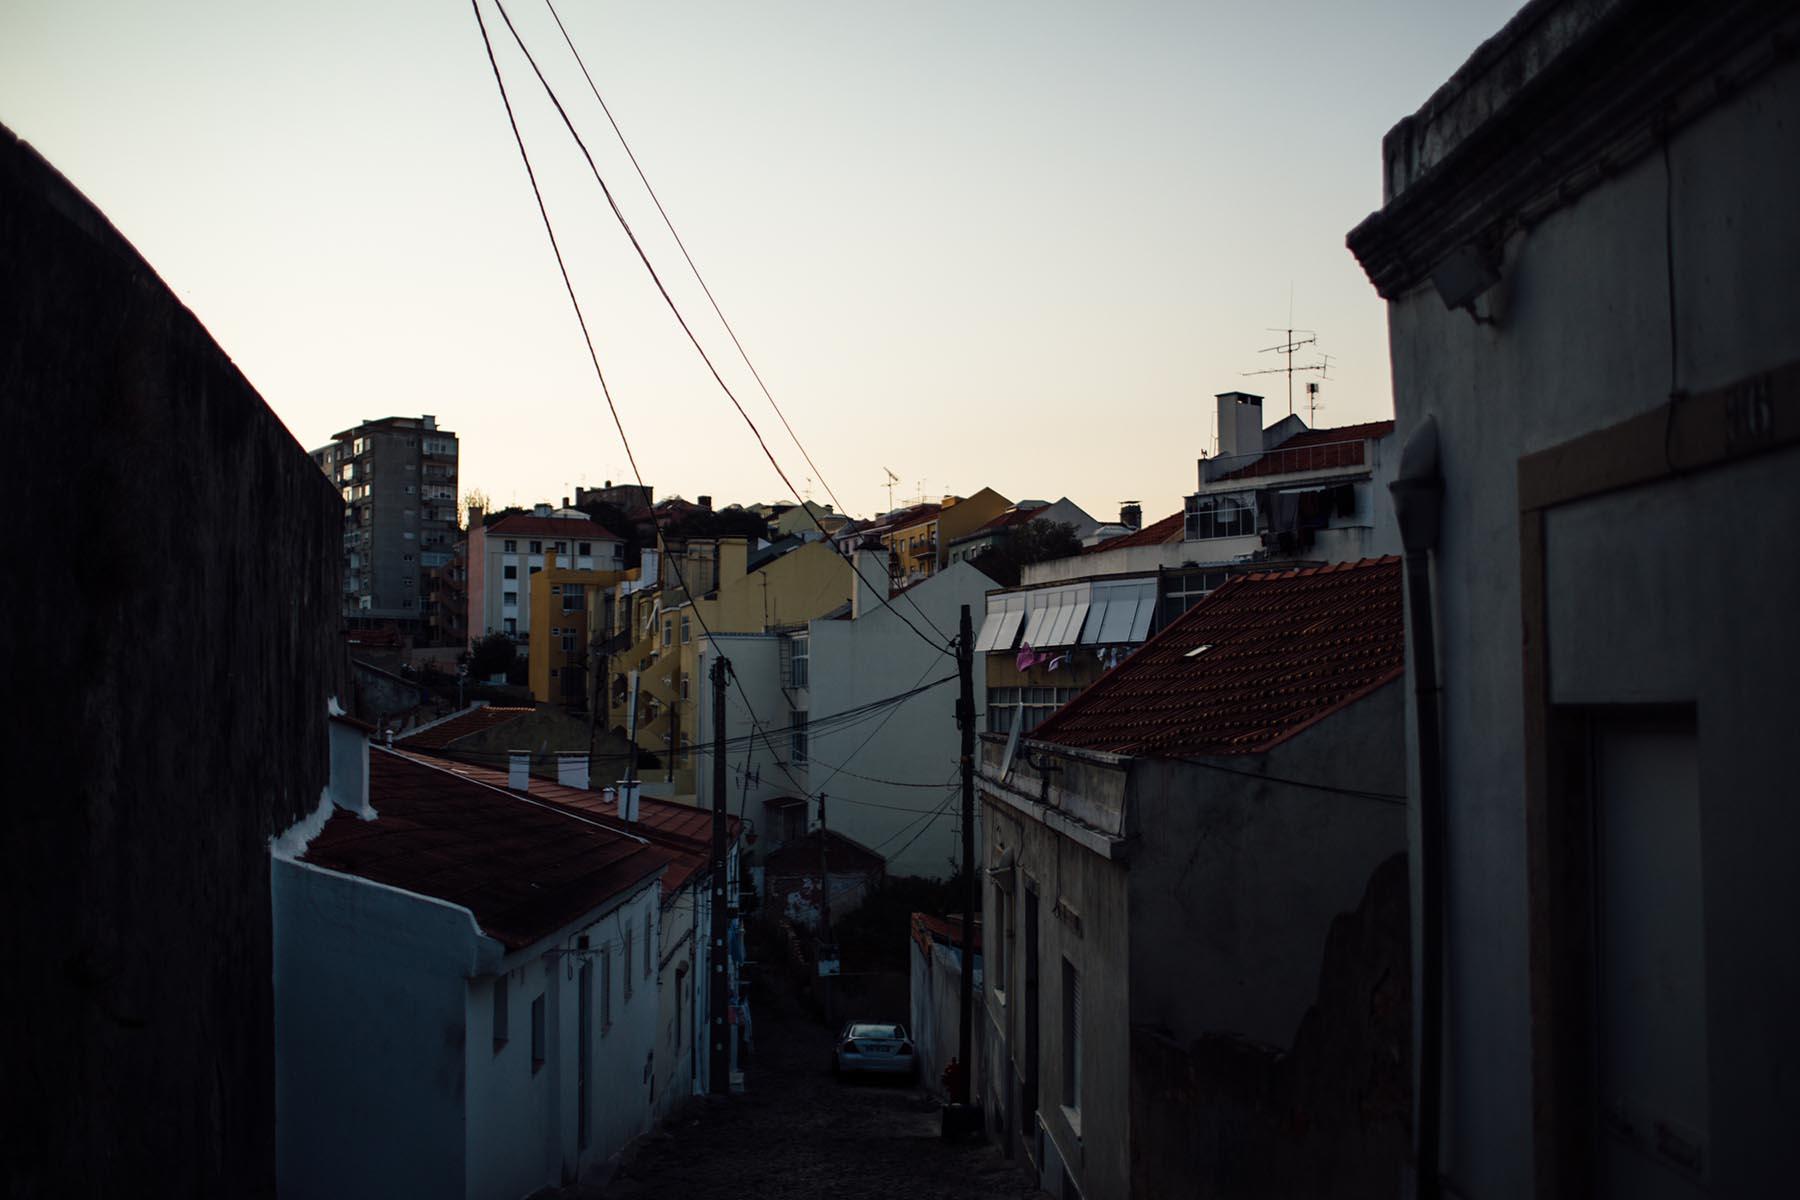 lissabon_streets_11.jpg